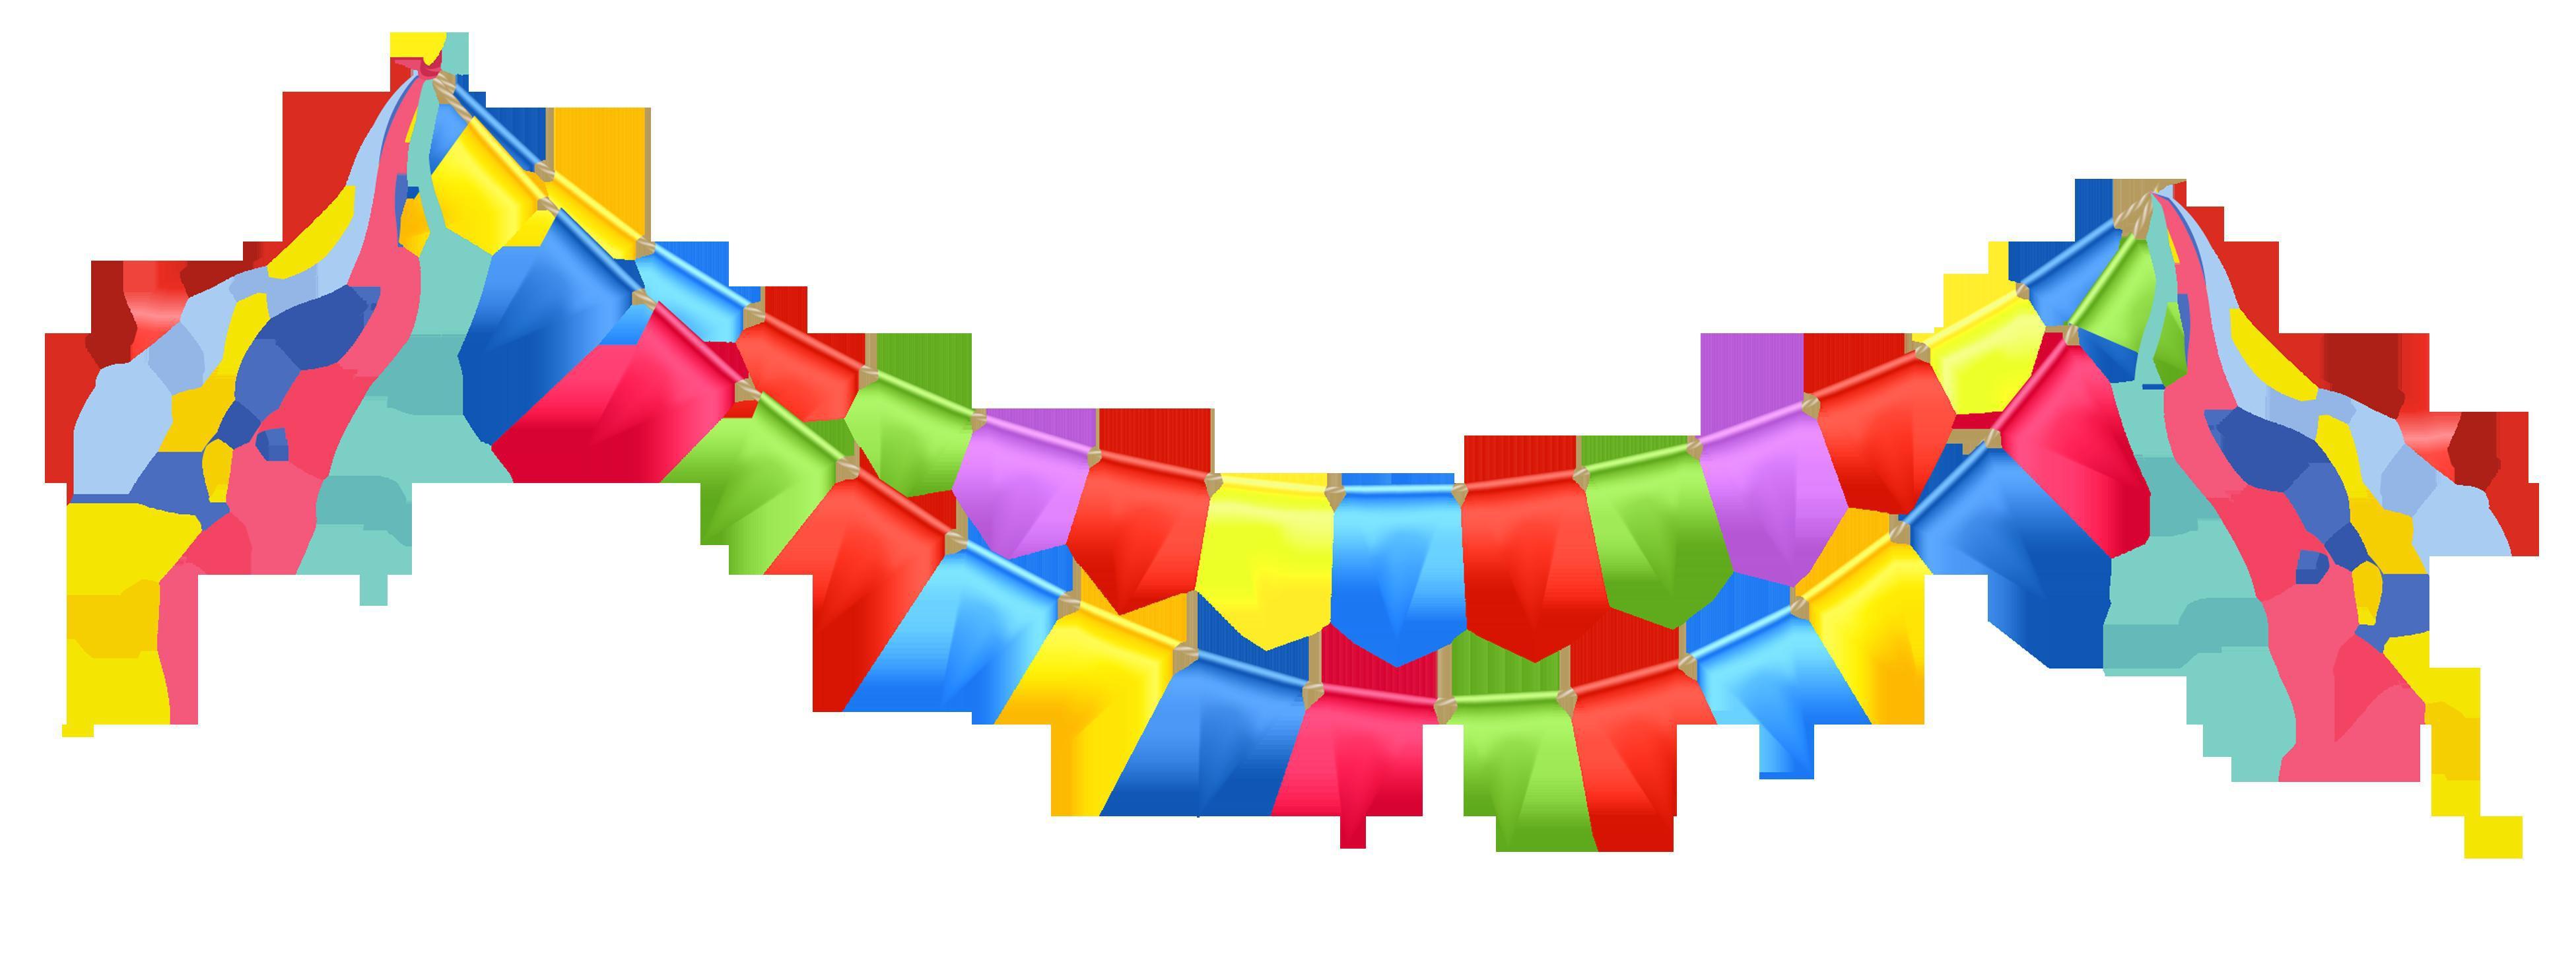 3902x1473 Birthday Party Banner Clip Art Unique Celebration Clipart